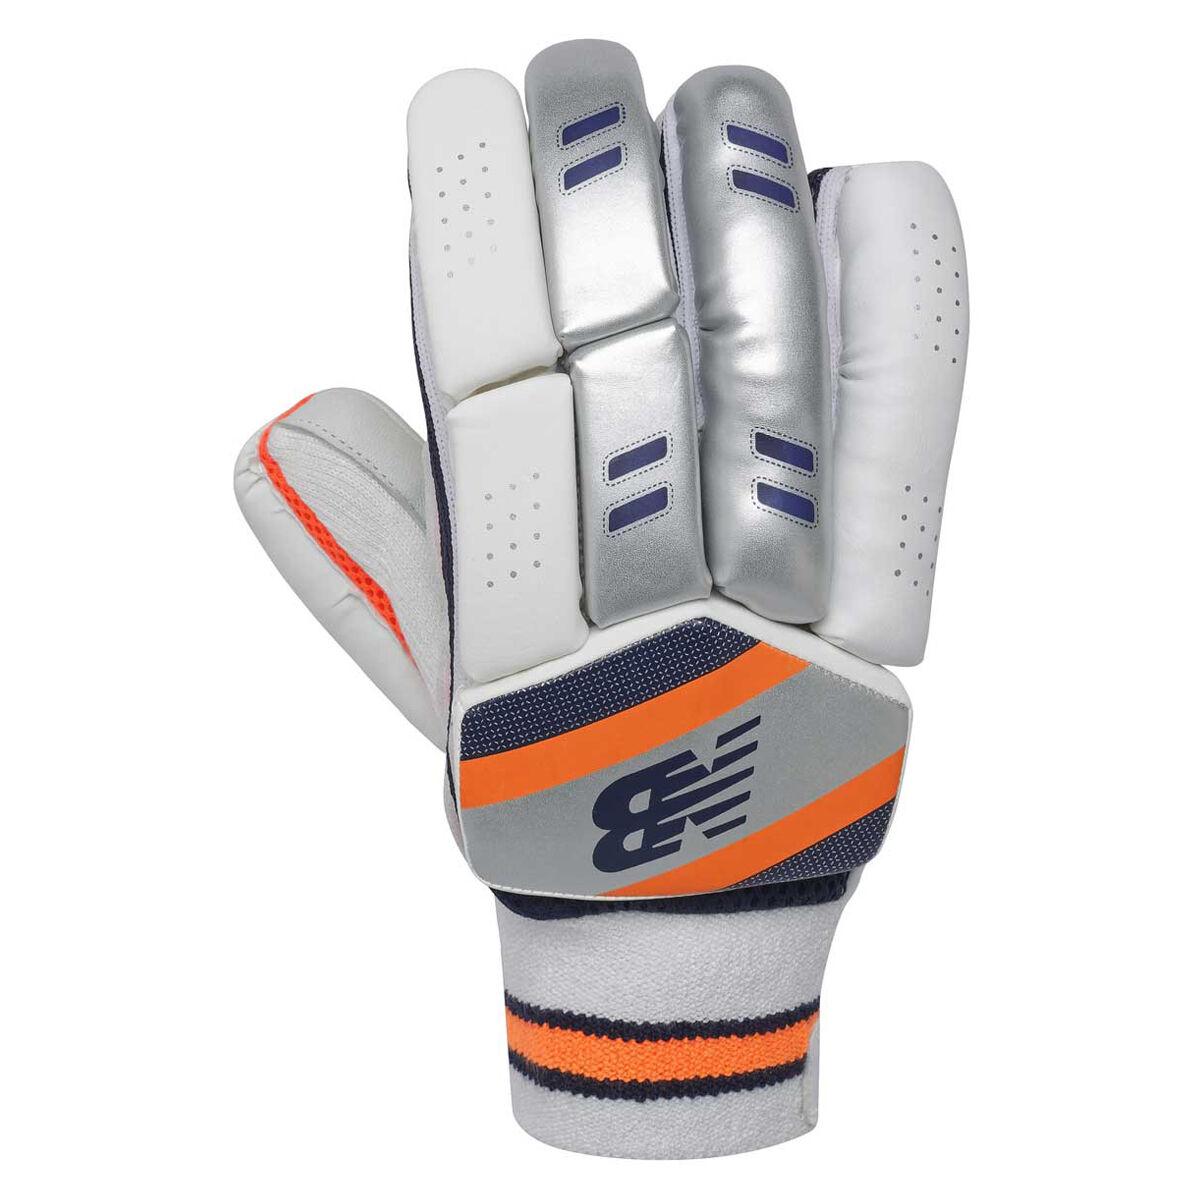 nike flex run 2015 blue graphite   New Balance DC 400 Junior Cricket Batting Gloves